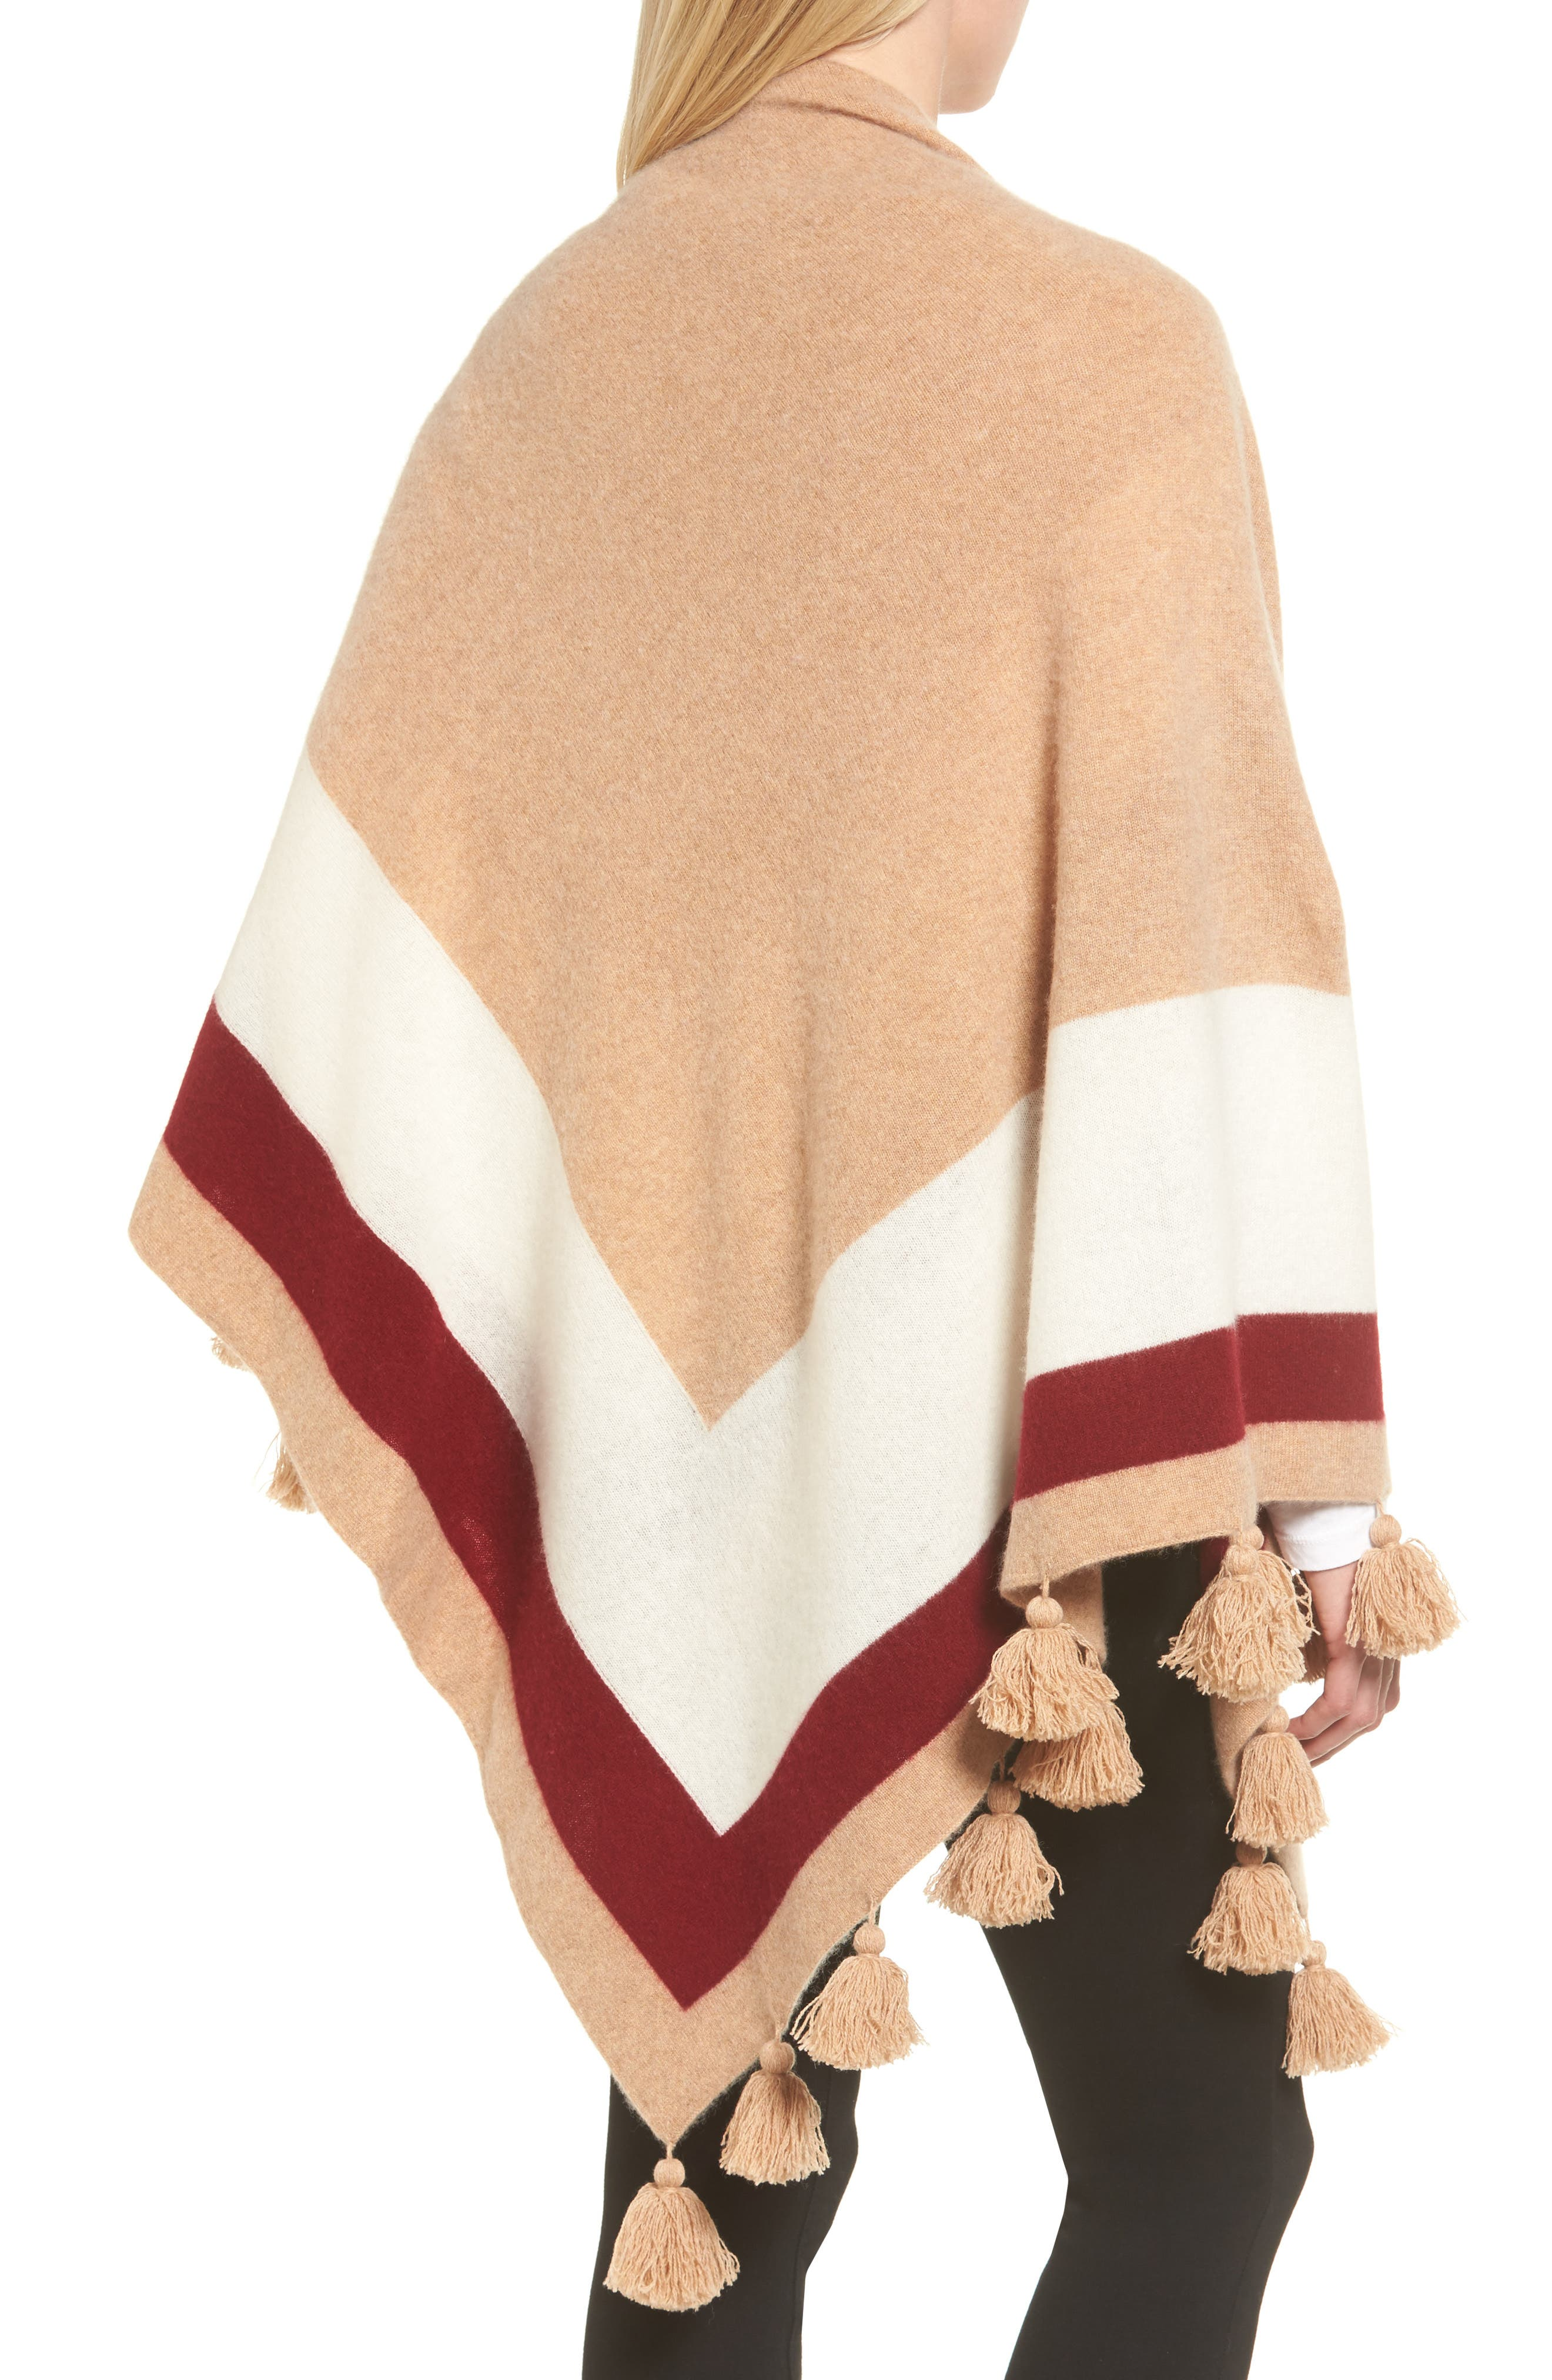 Tassel Trim Cashmere Wrap,                             Alternate thumbnail 2, color,                             Tan Camel Heather Combo